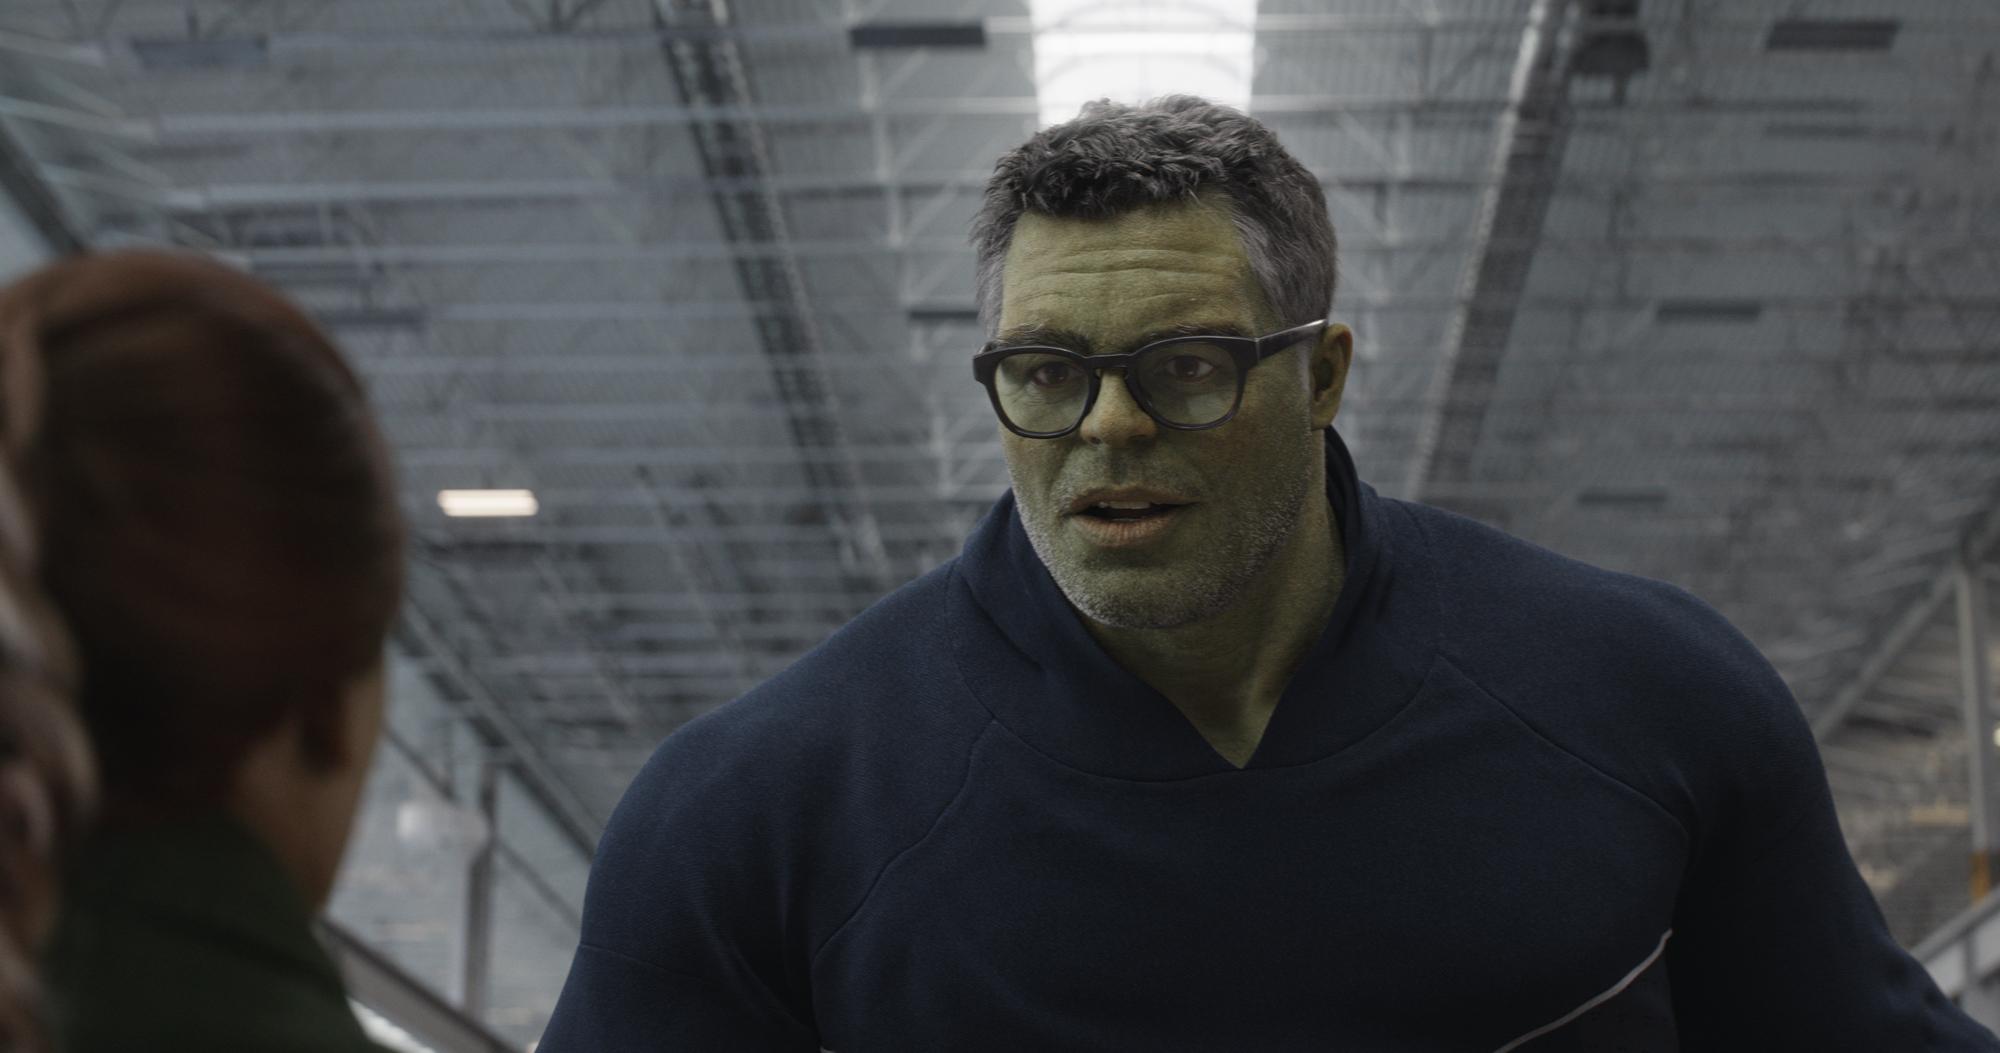 Avengers: Endgame, il costume di Hulk aveva un logo sul petto (o quasi) thumbnail